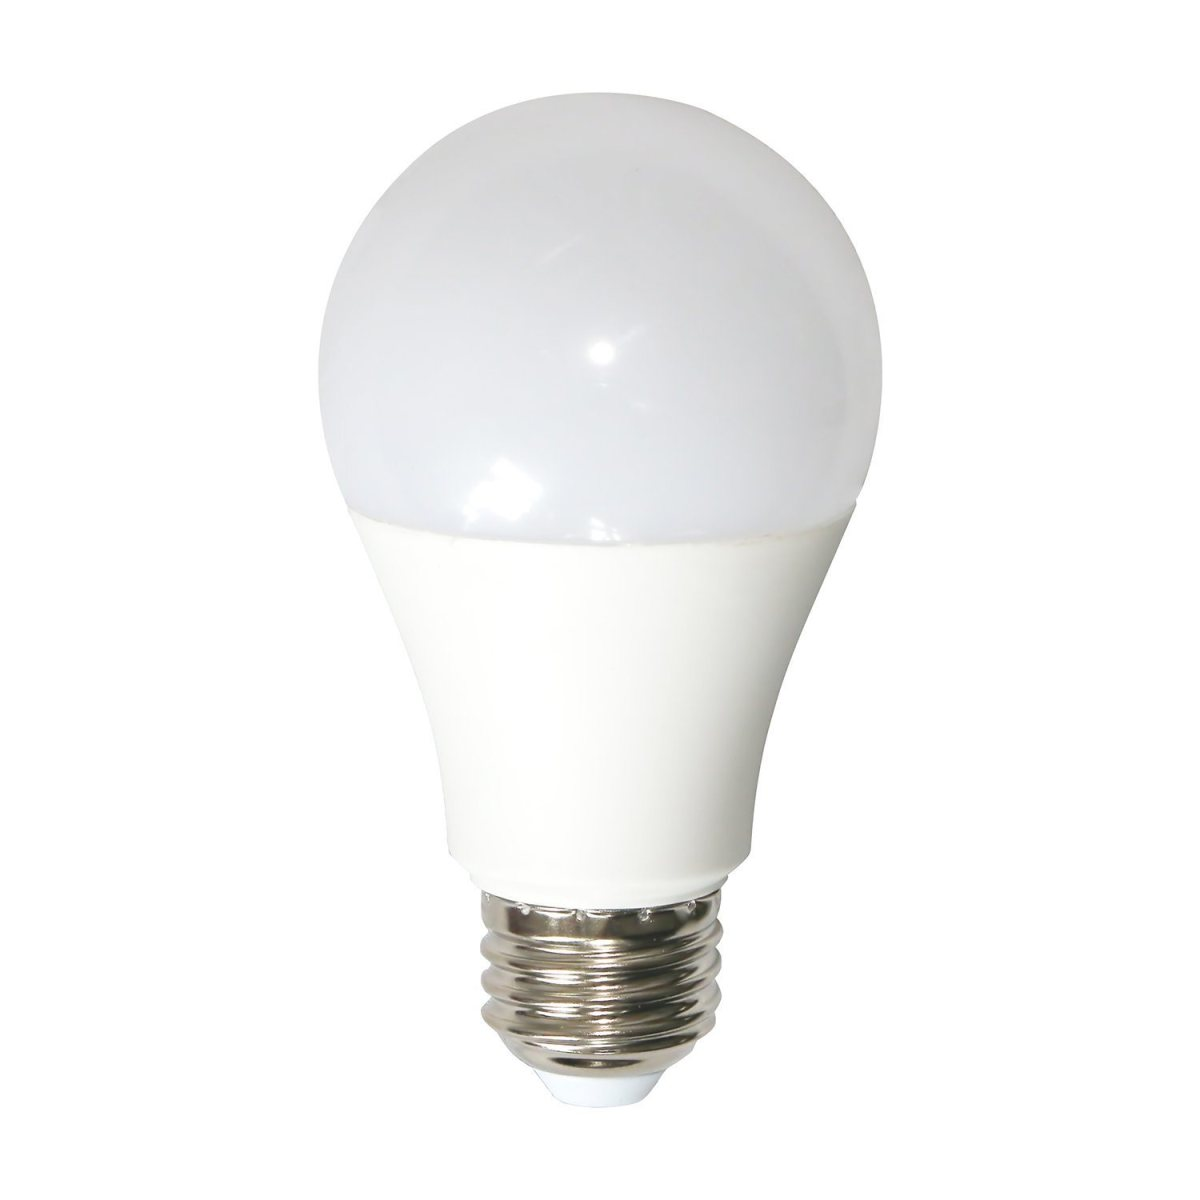 LampaLED A60 12W 1055LM E27 3000K 100-265V (TL)100